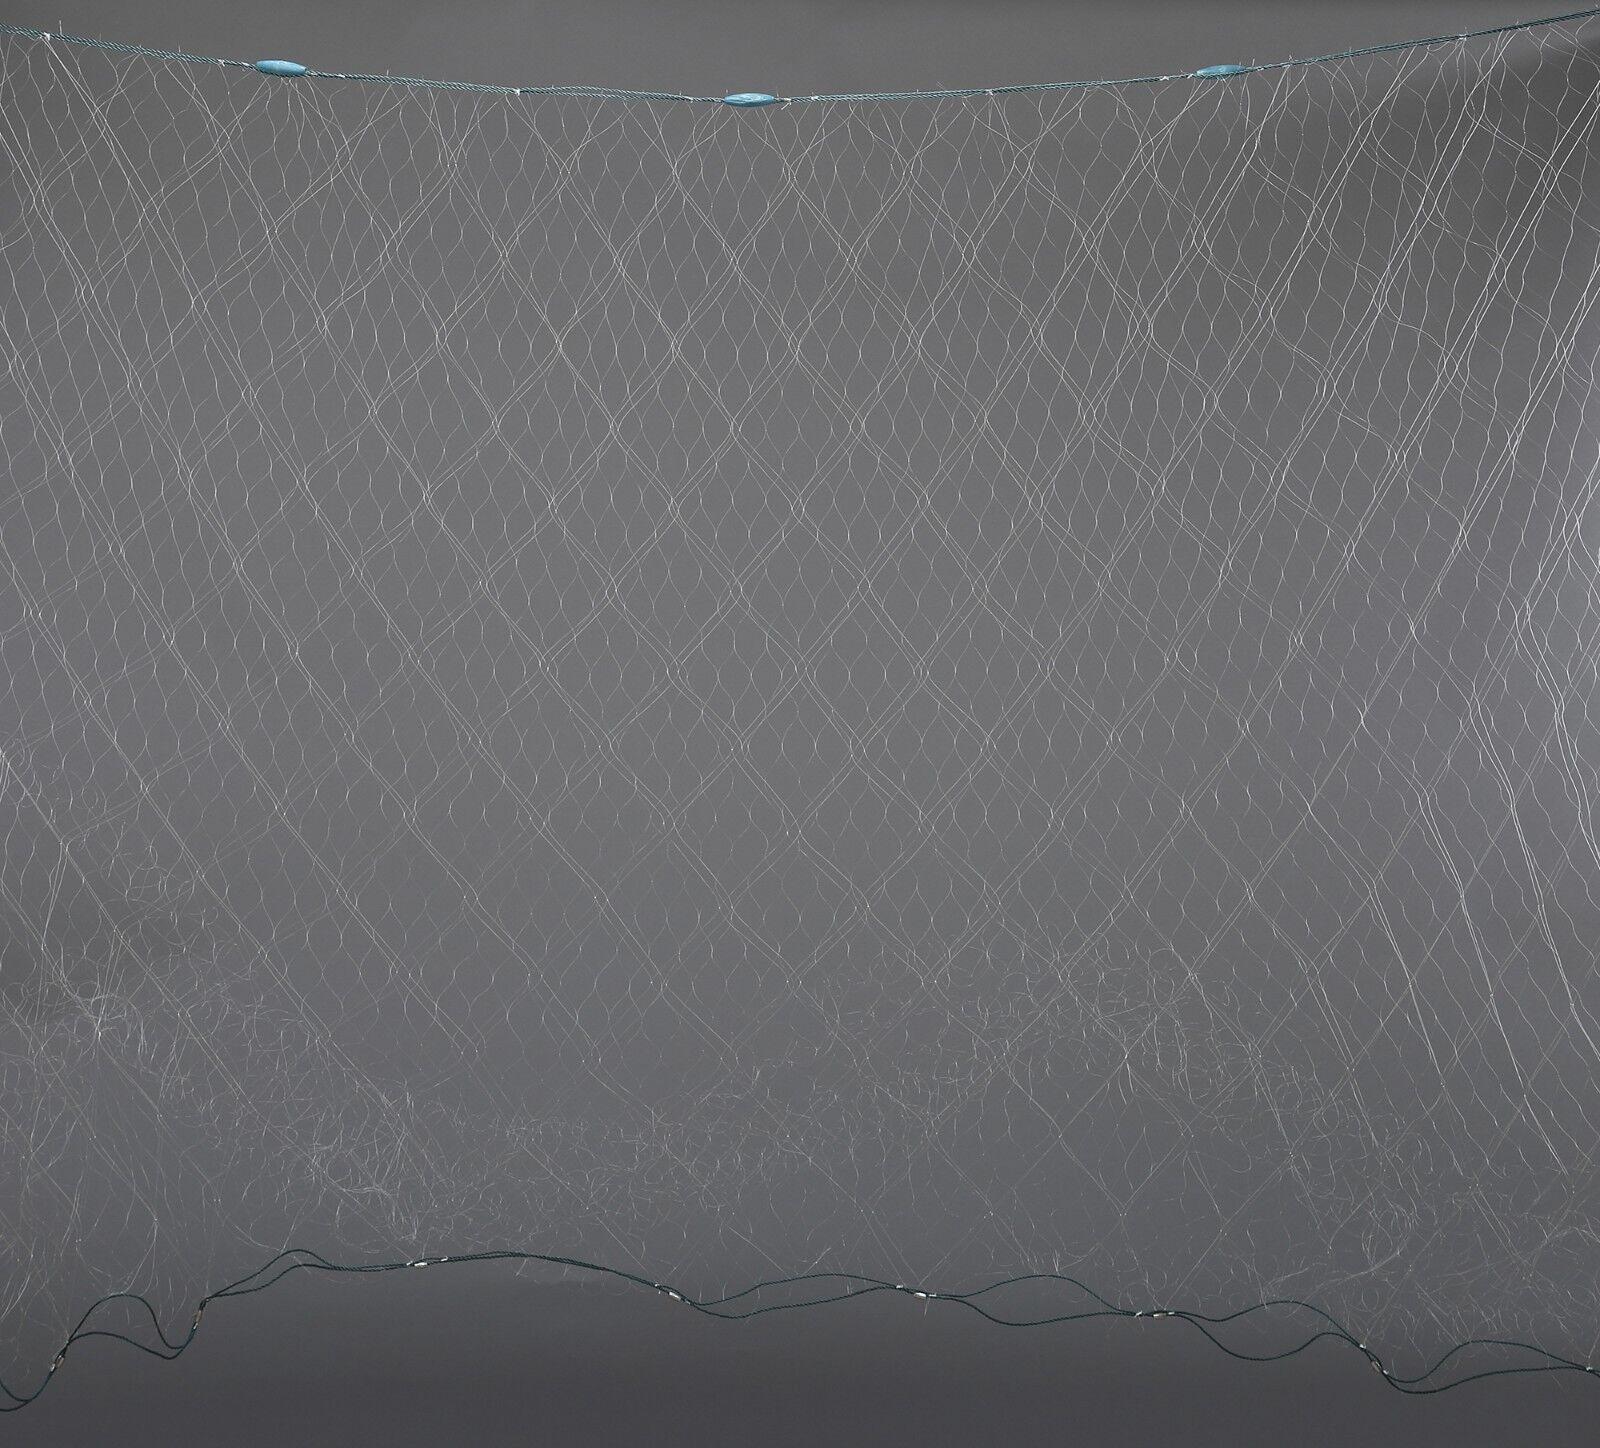 6'X100' Finished Trammel Fishing Net,  3 Layers Fishing Gill Net, Seine Net  simple and generous design